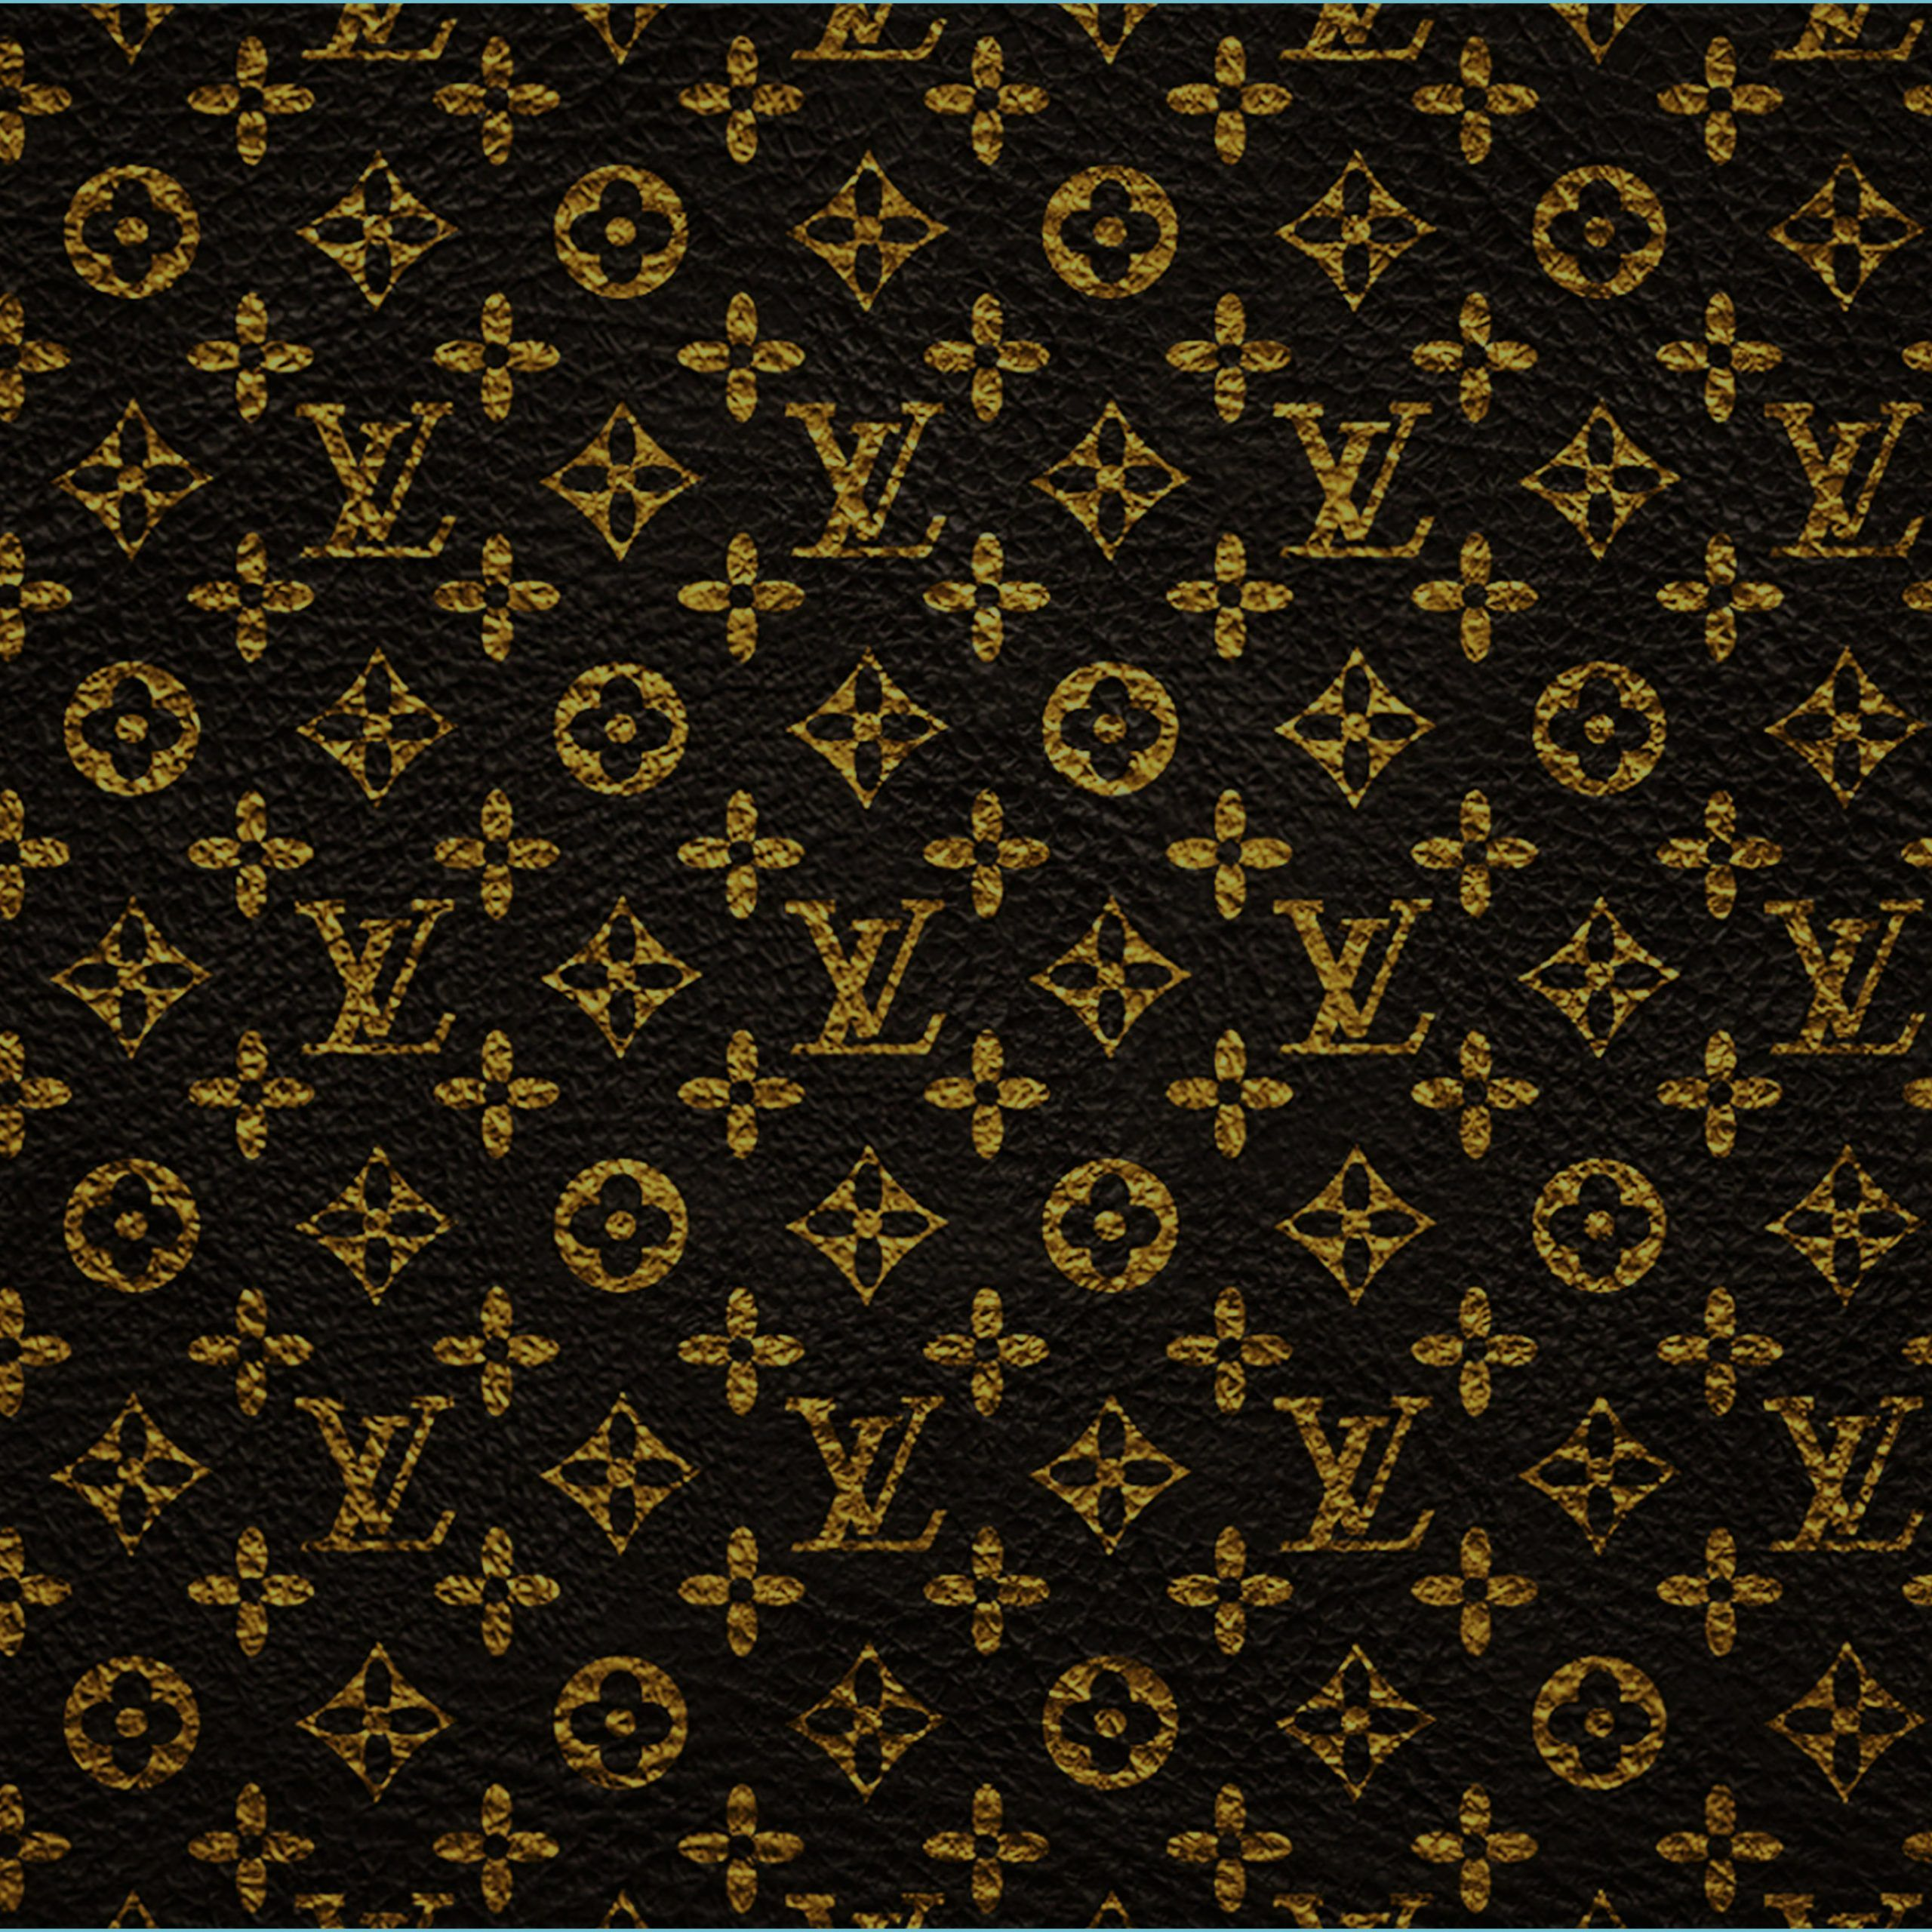 12 Reasons Why People Like Black Louis Vuitton Wallpaper Black Louis Vuitton Wall Black Louis Vuitton Louis Vuitton Background Louis Vuitton Iphone Wallpaper